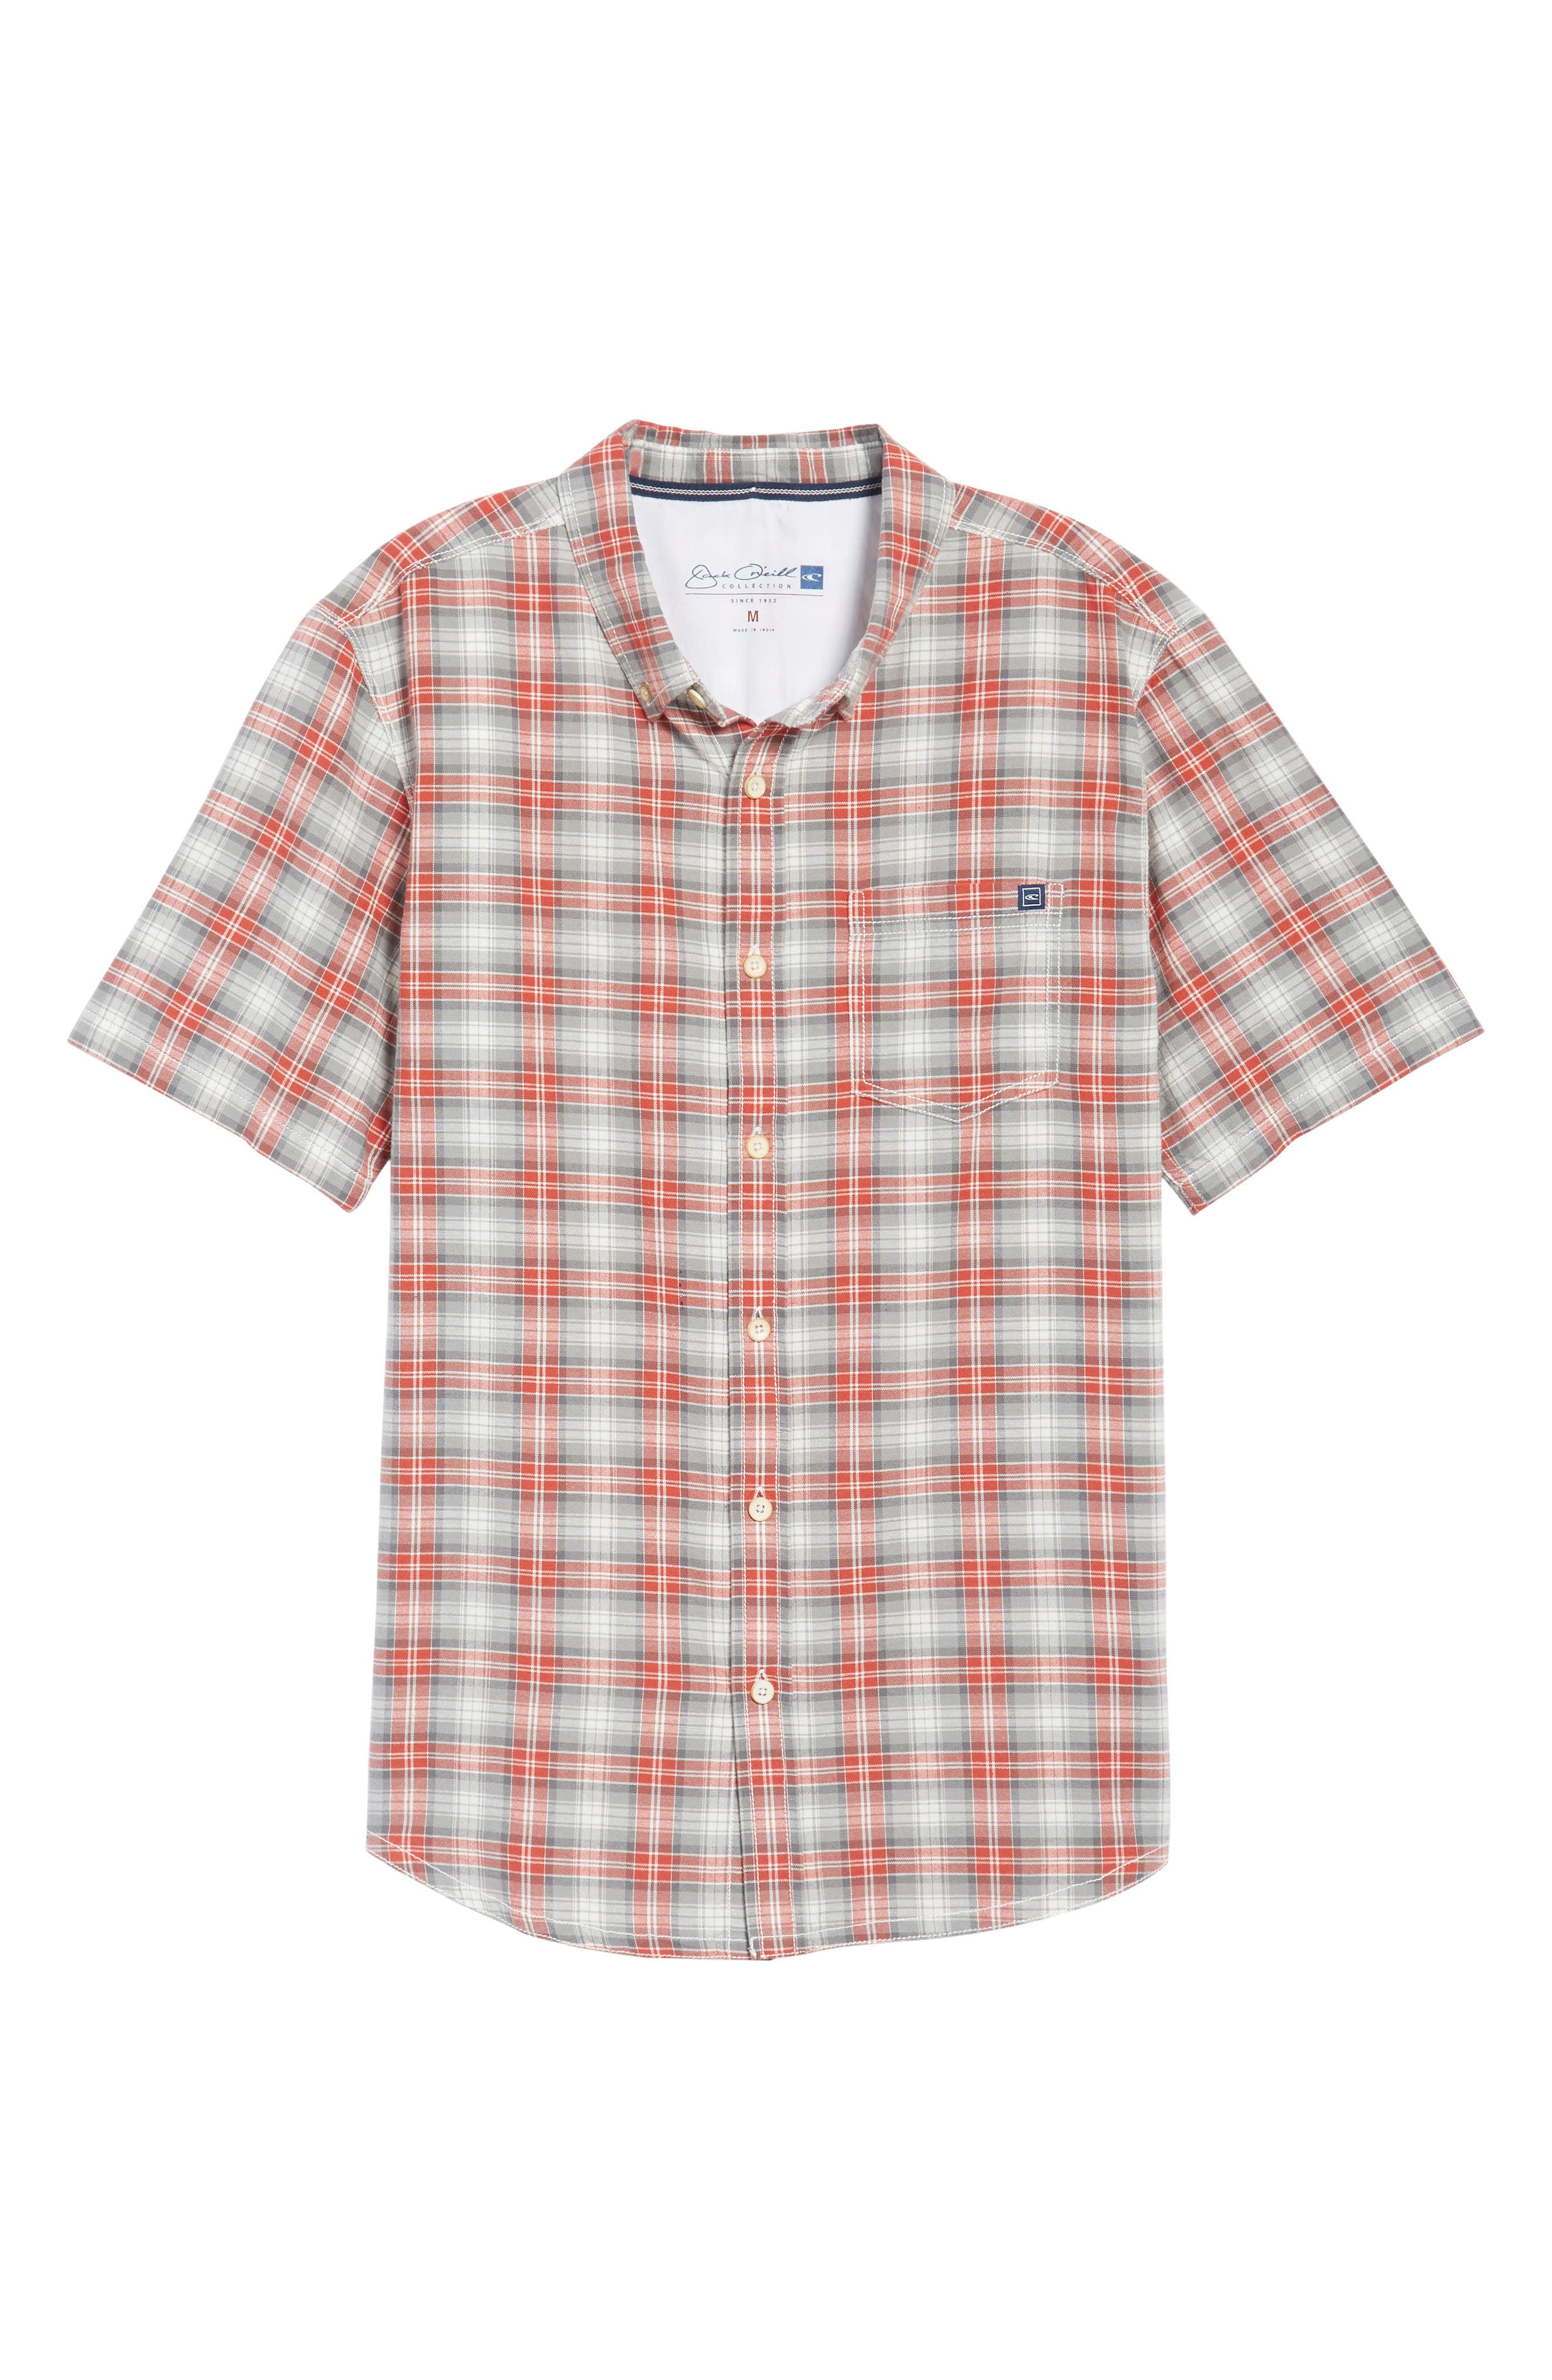 Voyager Plaid Sport Shirt,                             Alternate thumbnail 6, color,                             Tandori Spice